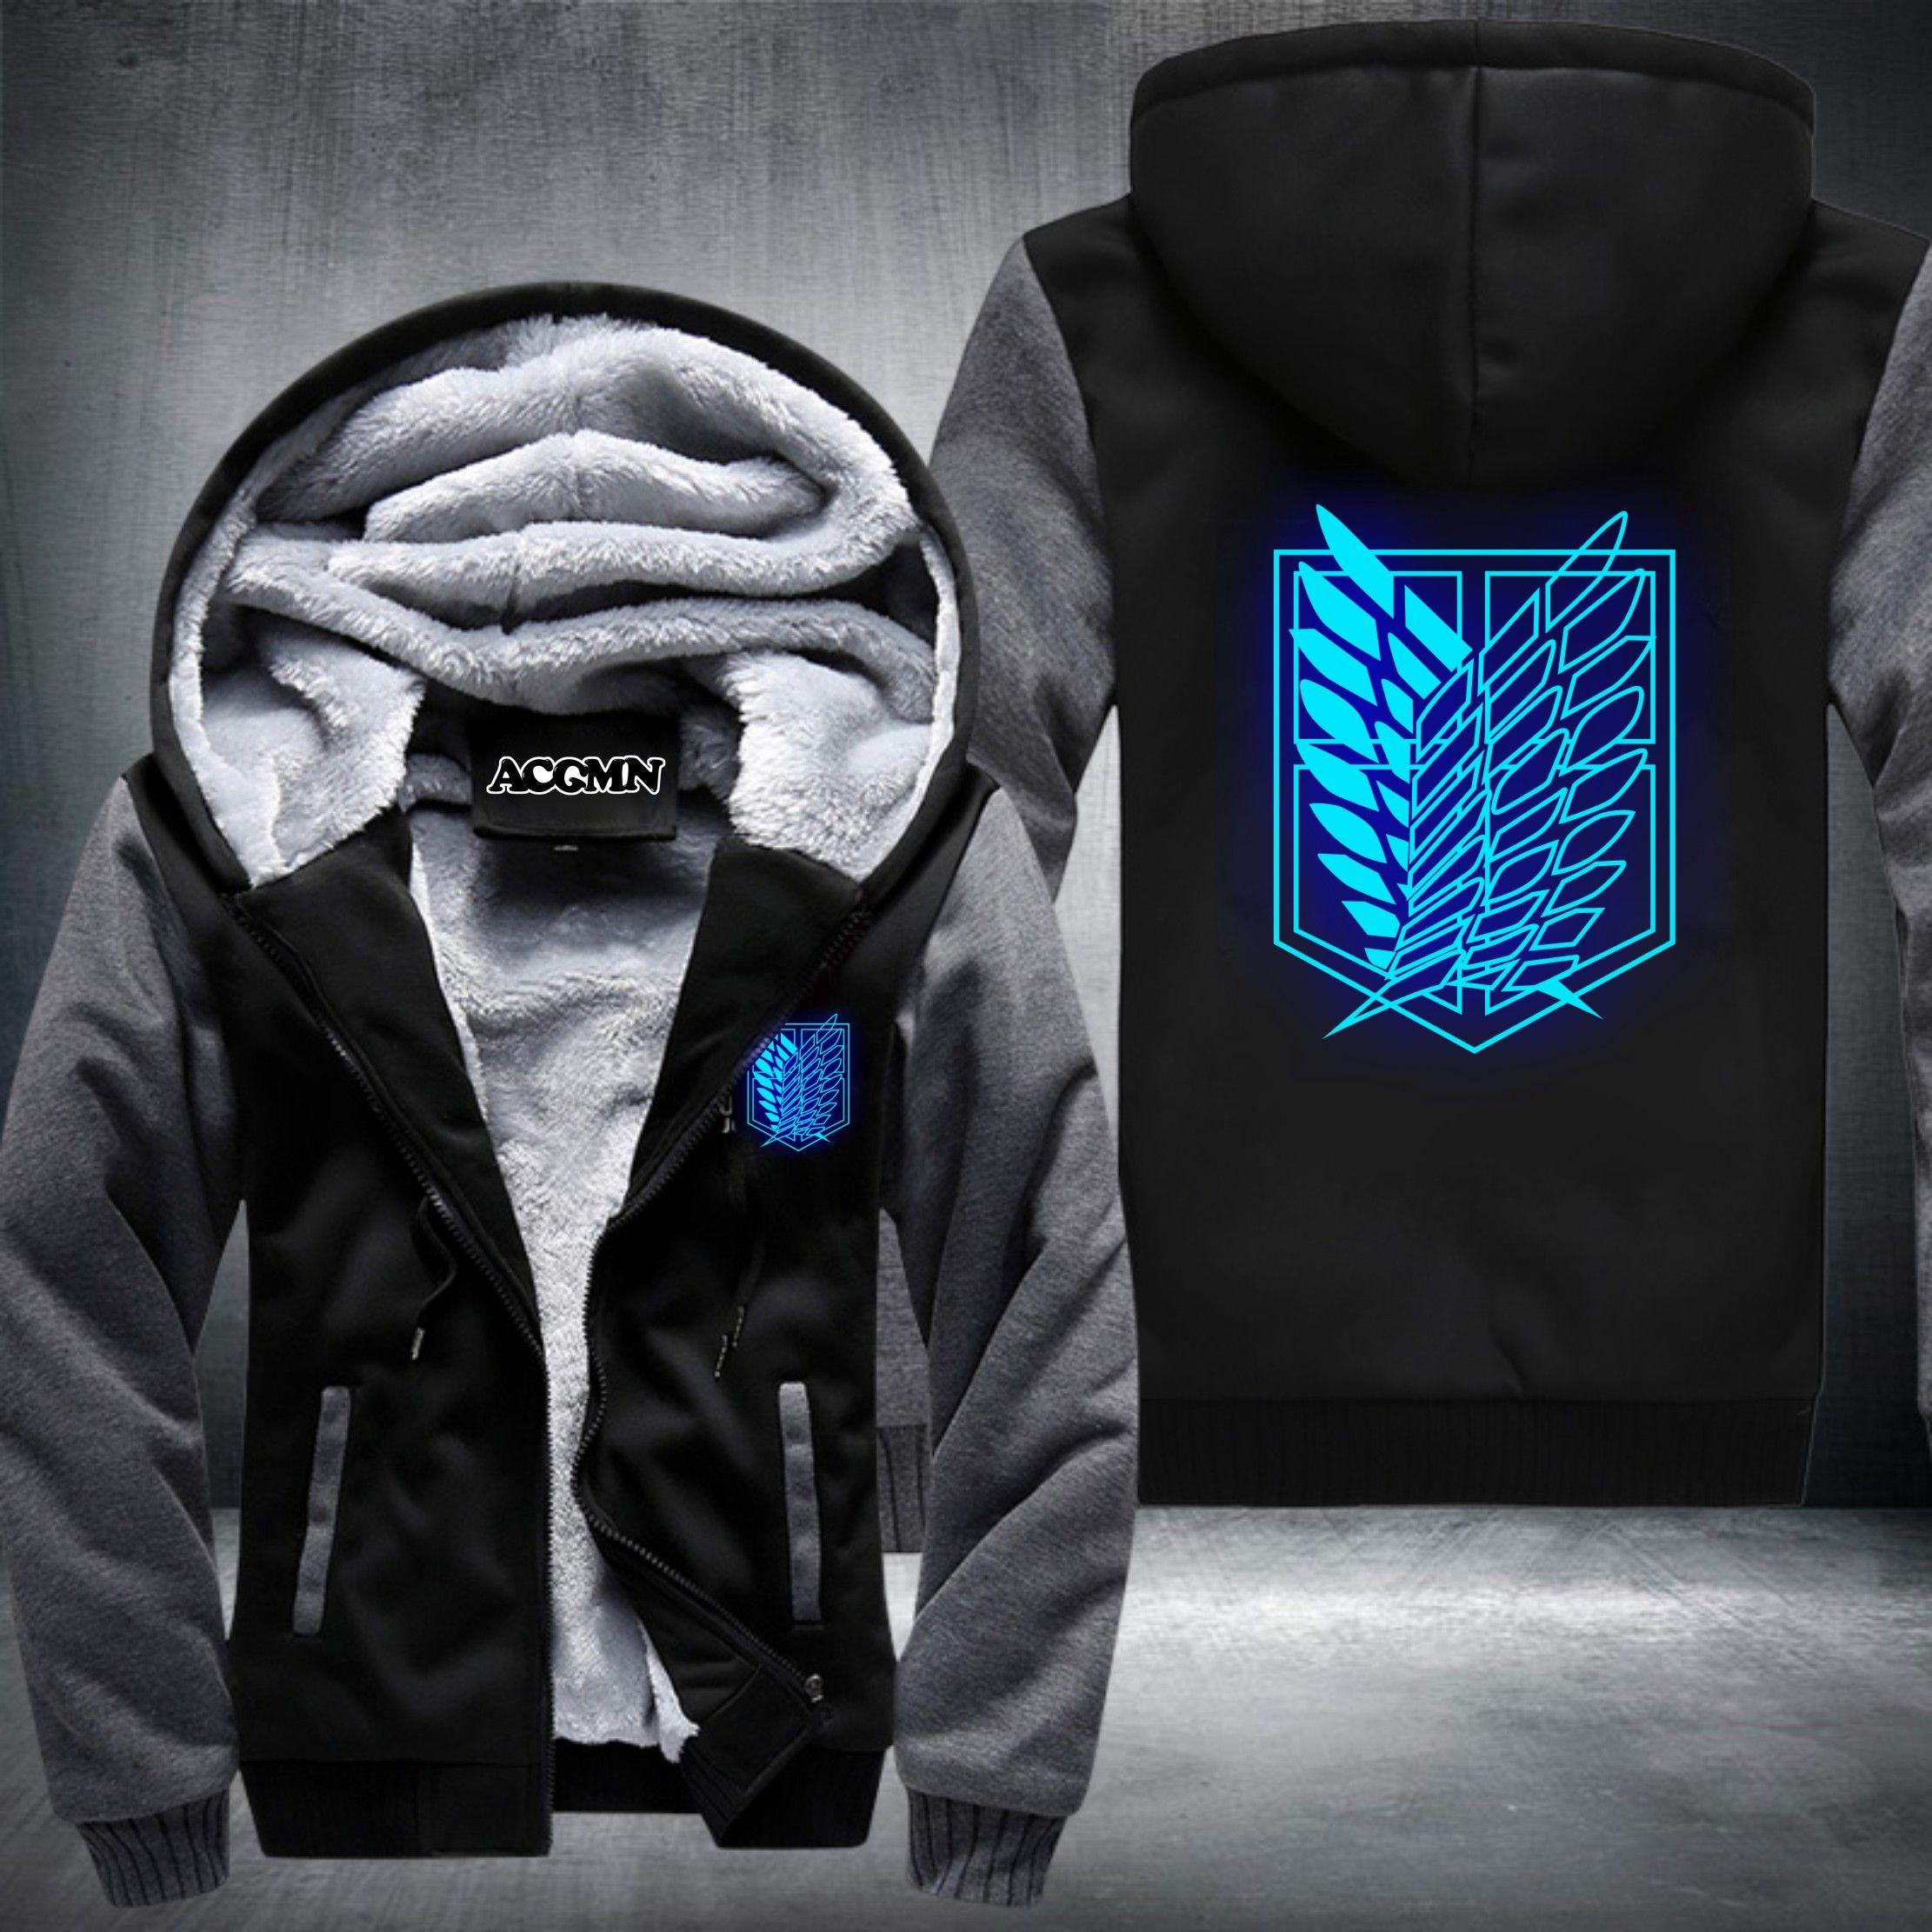 795149f0822 2019 Wholesale New Shingeki No Kyojin Attack On Titan Aren Thicken Jacket  Hoodies Coat Extra Cotton Black BLUE GREY RED USA Size From Felix06